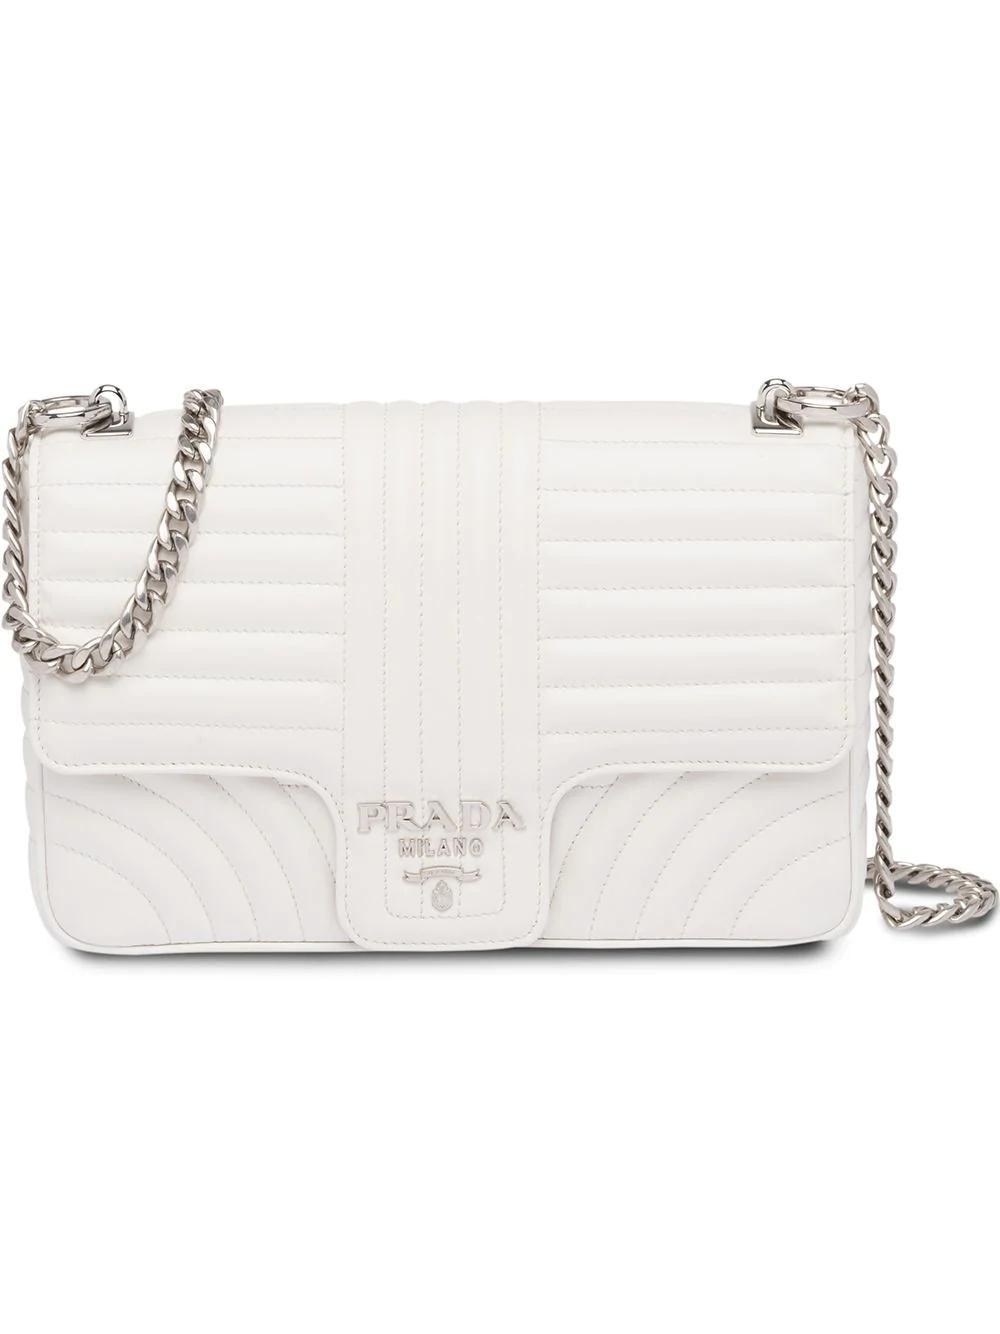 3ee573747731 Prada Diagramme Leather Shoulder Bag - White | ModeSens